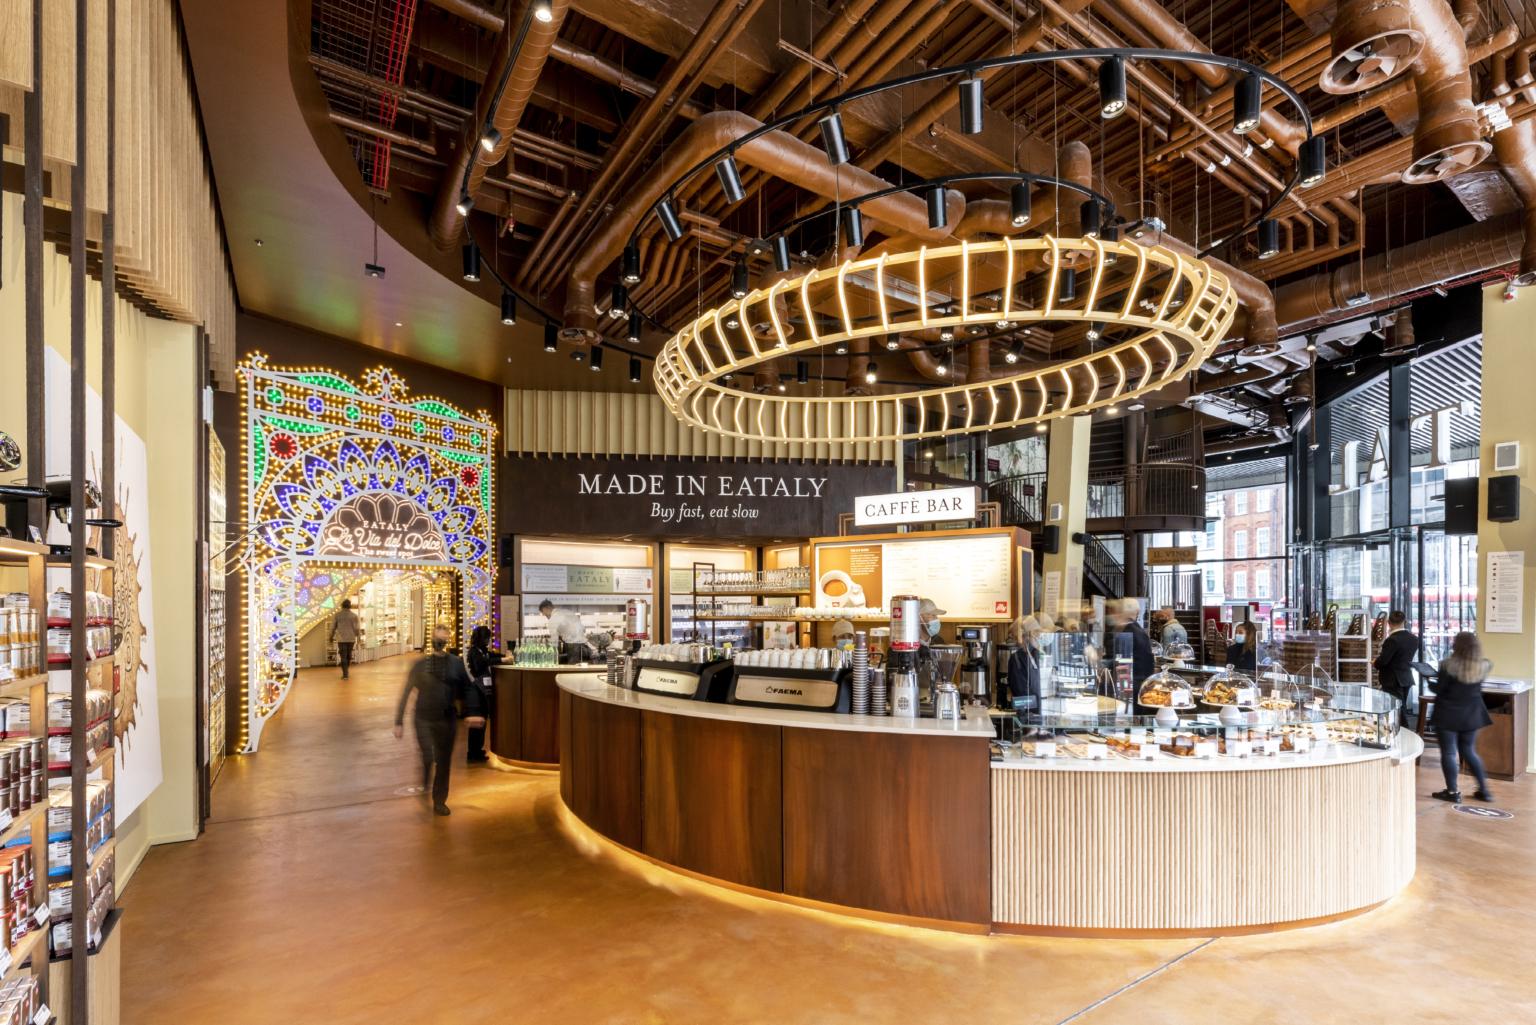 Italian Food Hall Eataly opens in Broadgate